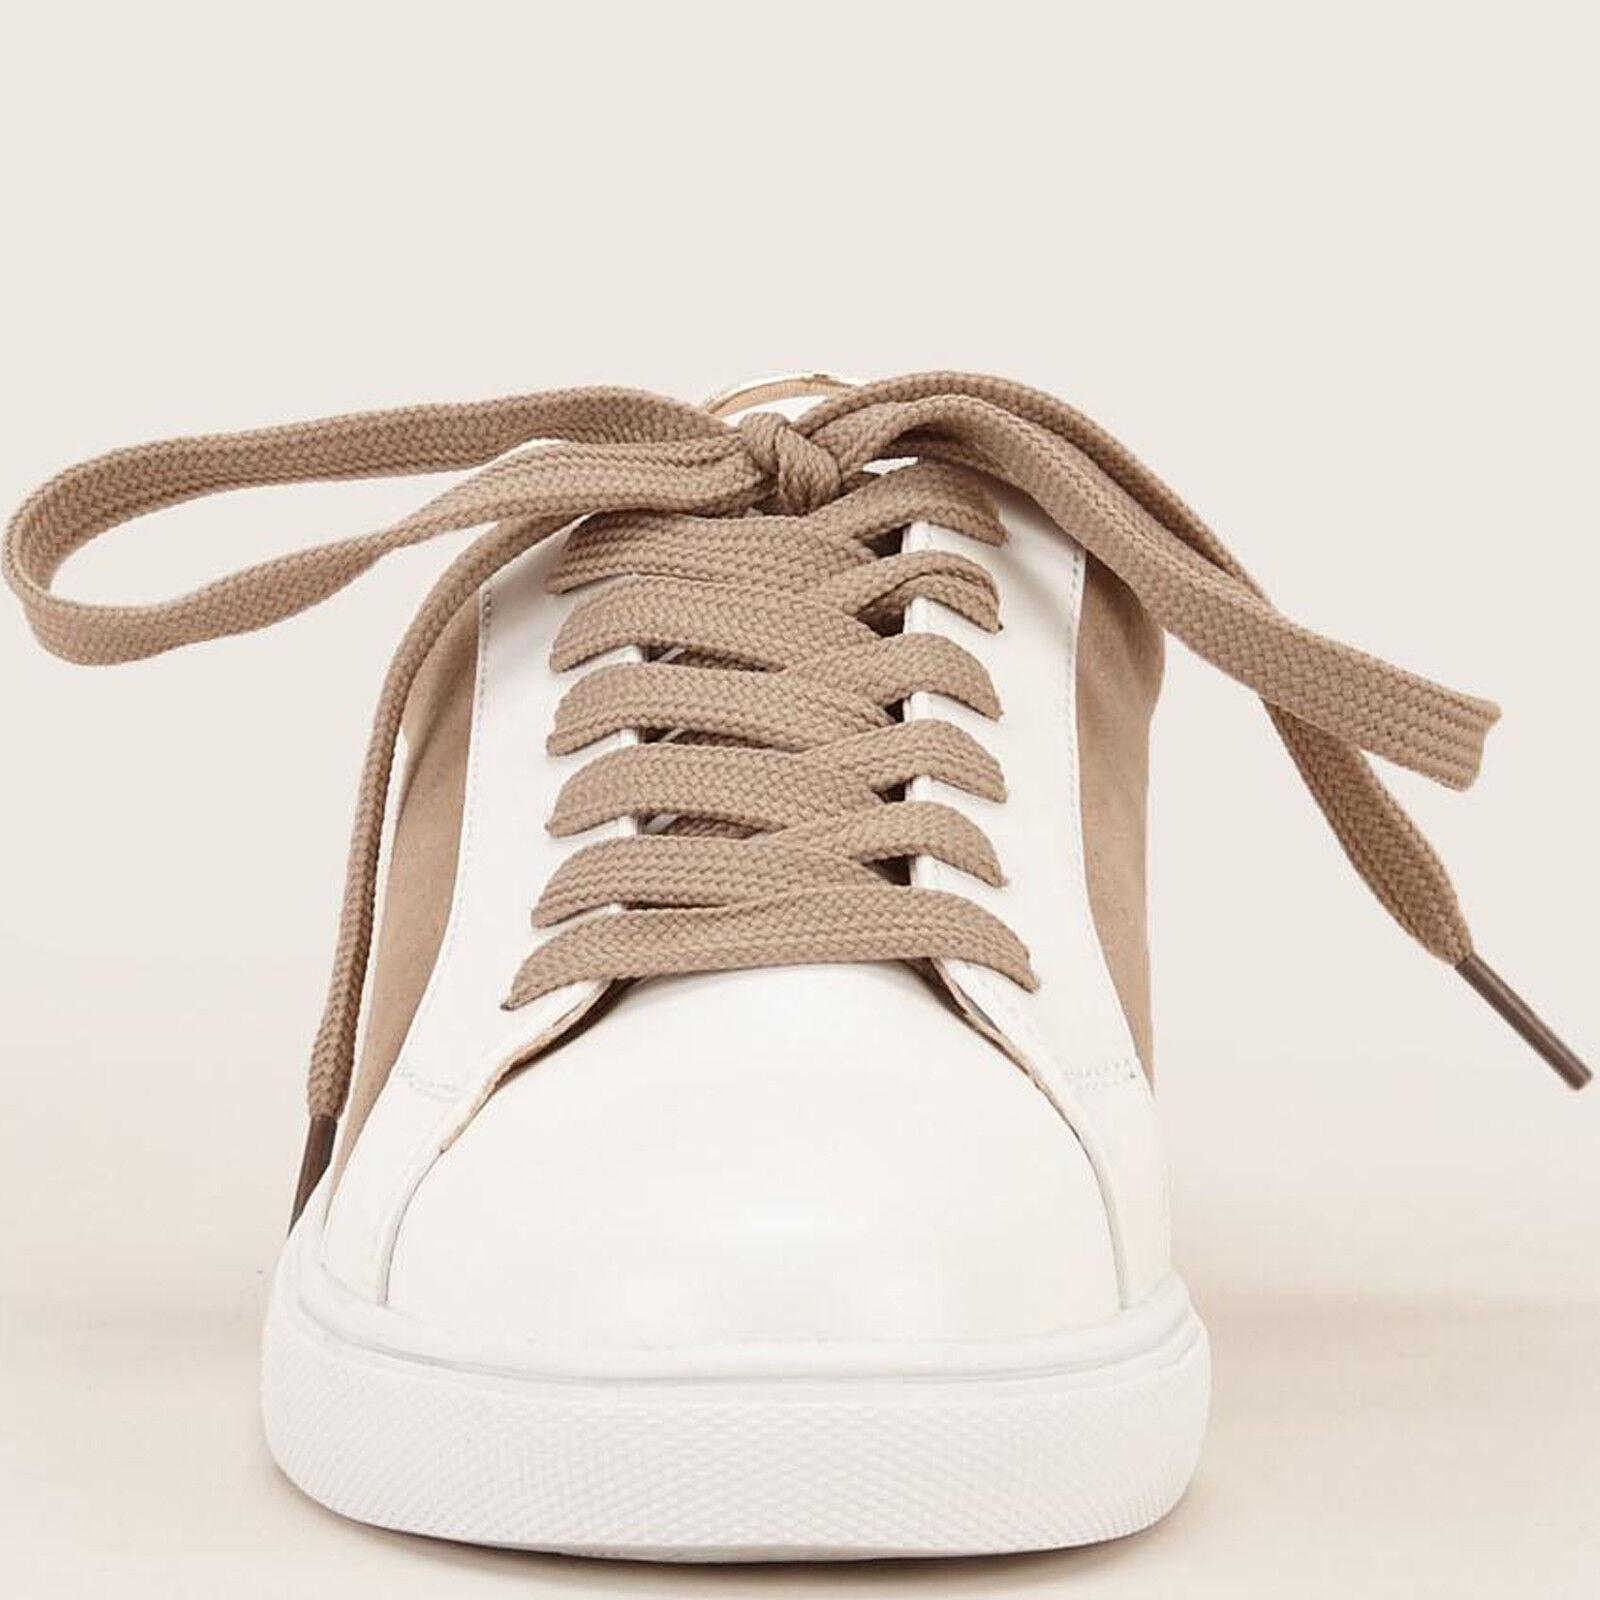 French Designer Vanessa Wu Damens Sneakers Flat Trainer Niedrig-Cut Schuhes UK 3 EU 36